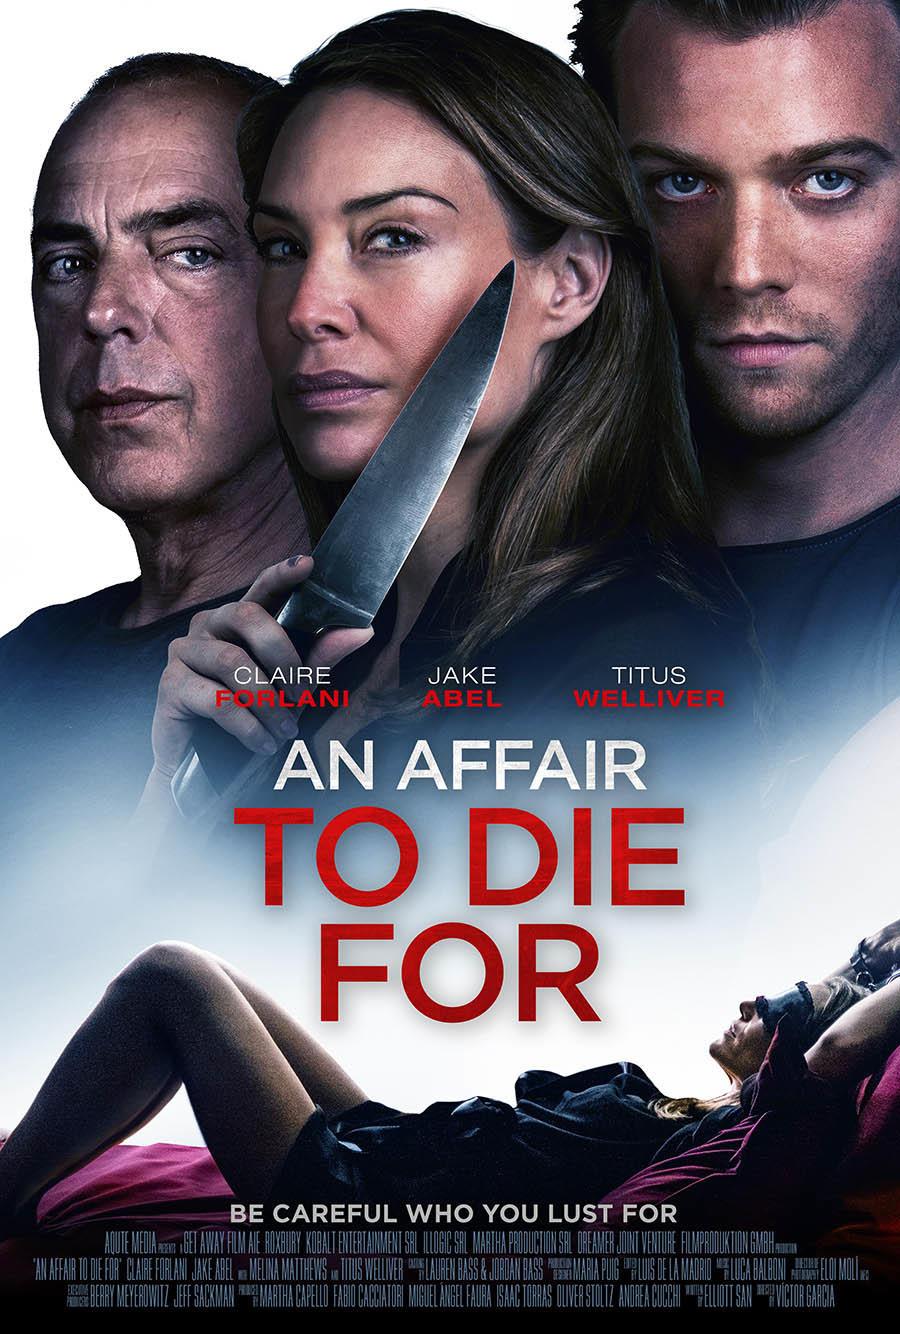 Andrea Garcia Play an affair to die for | fandango